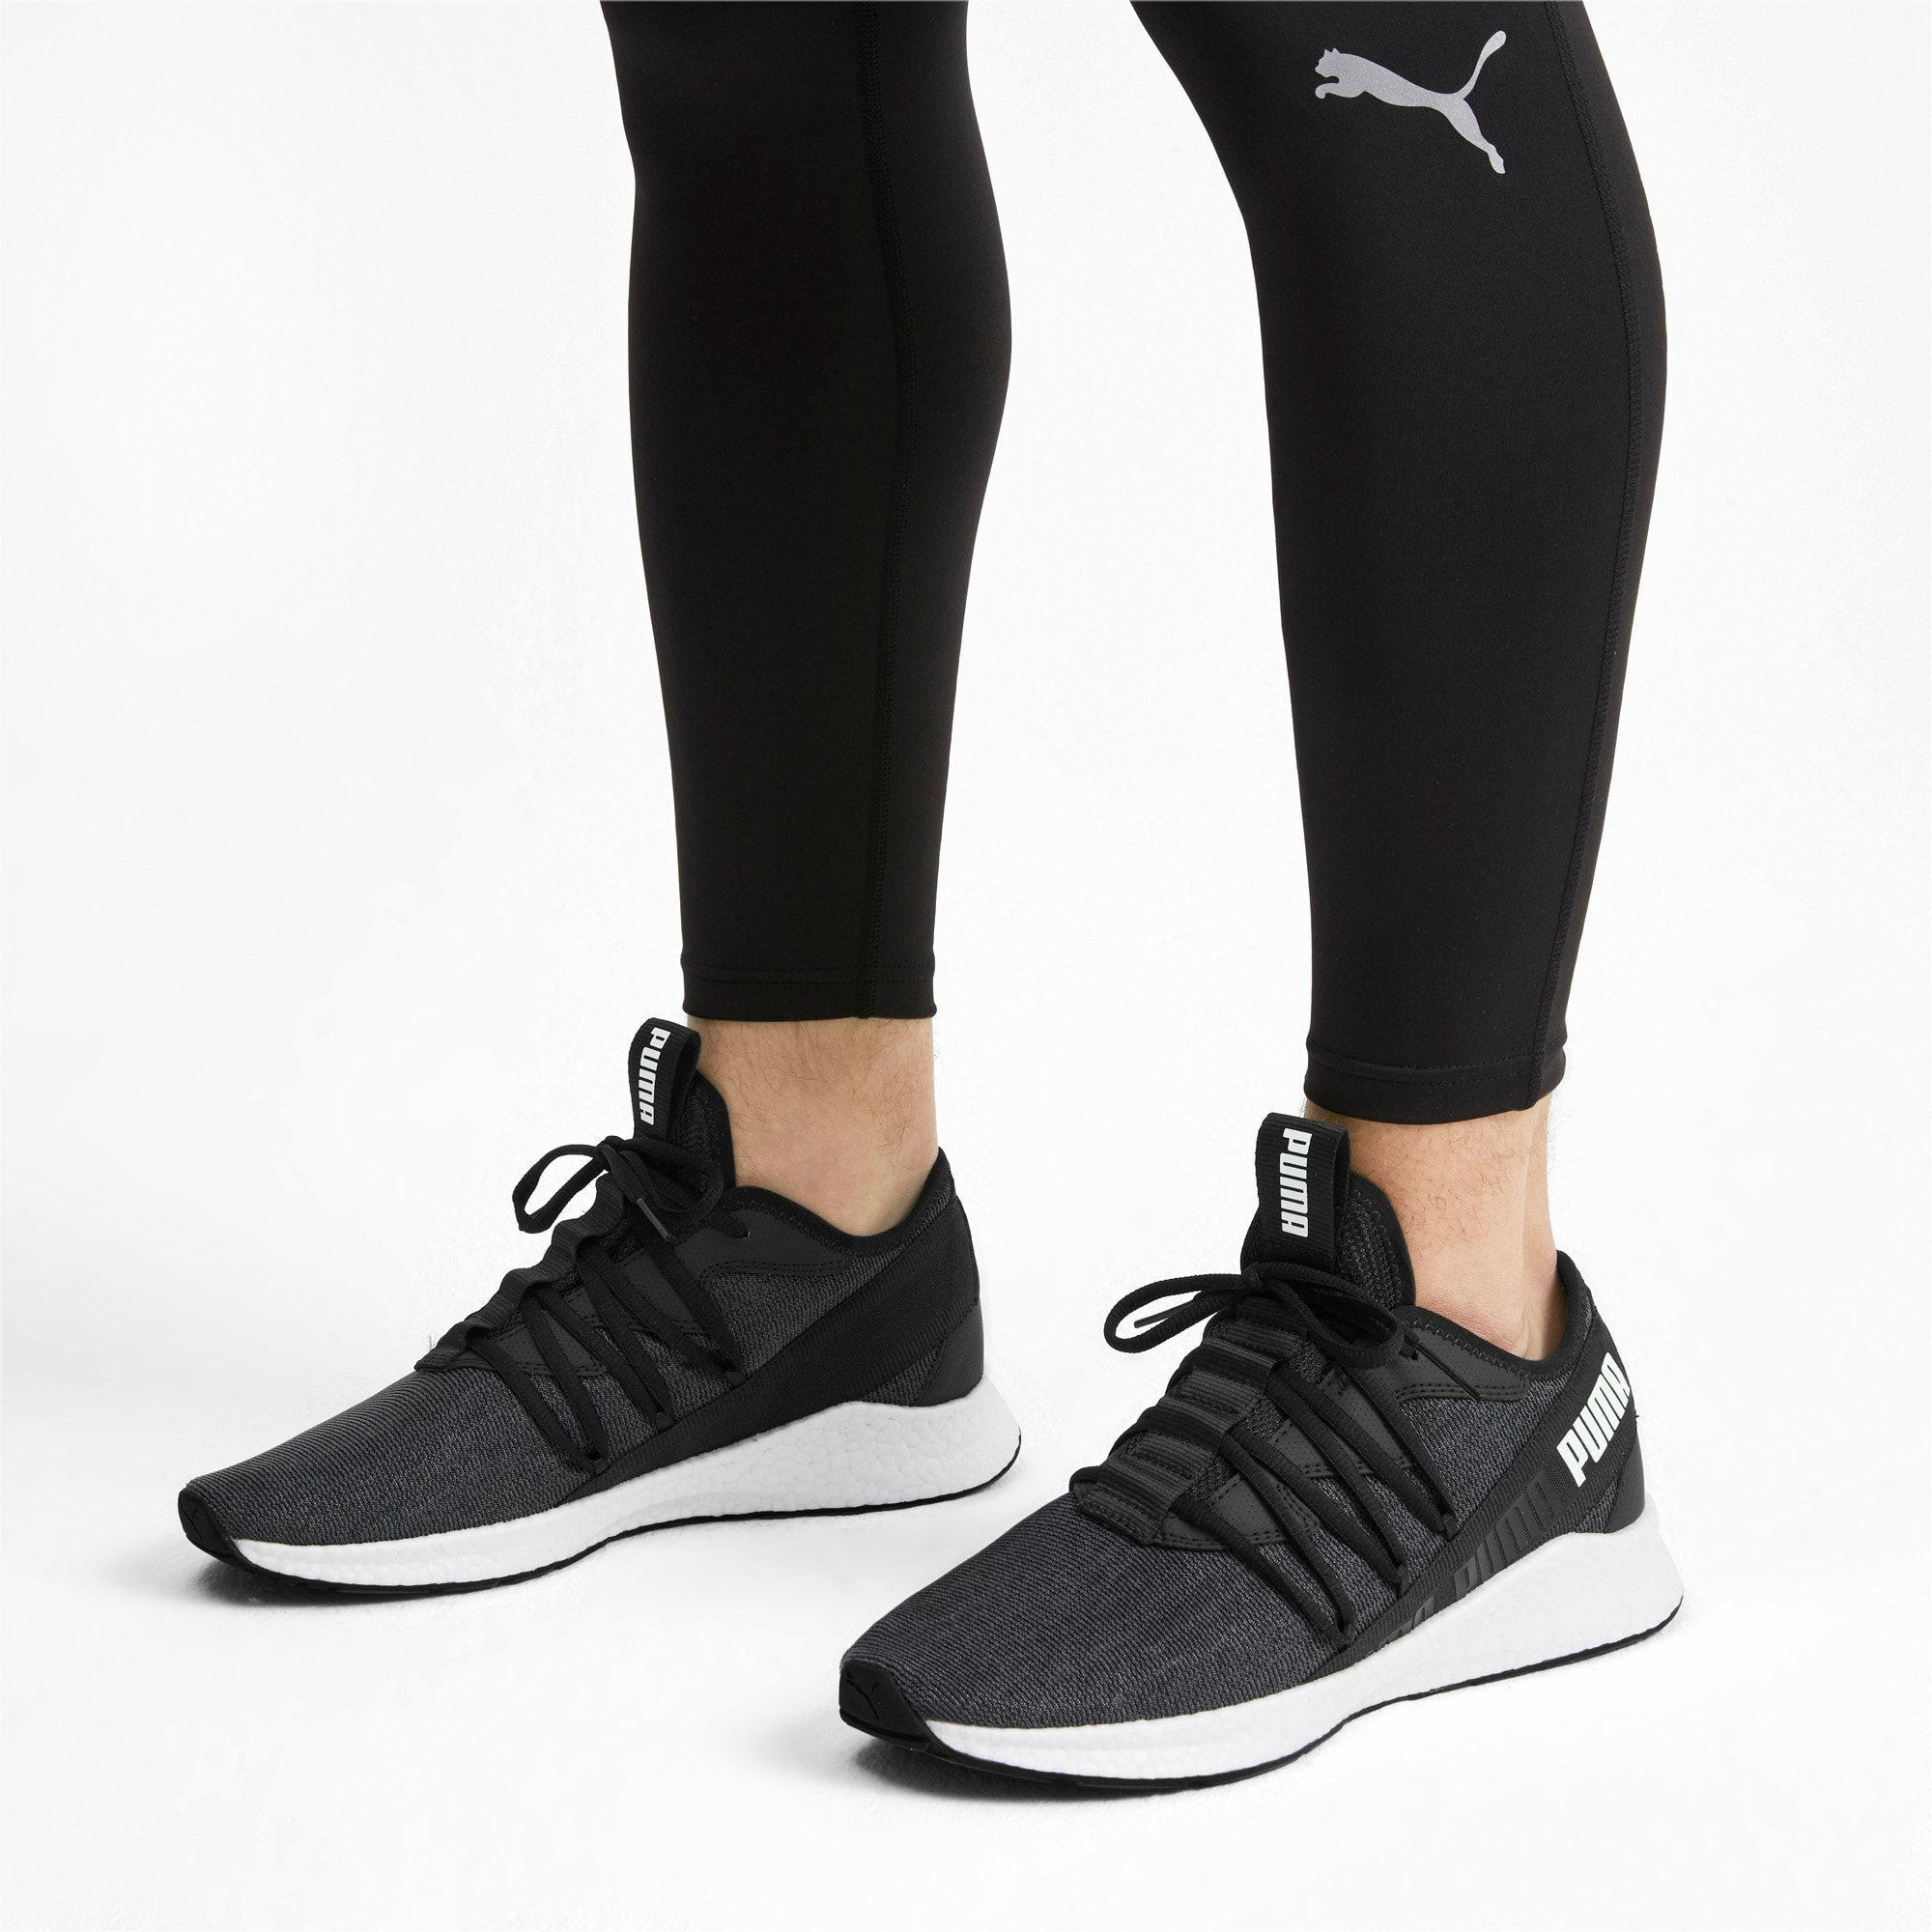 NRGY Star Knit Running Shoes | Black puma, Running shoes, Black